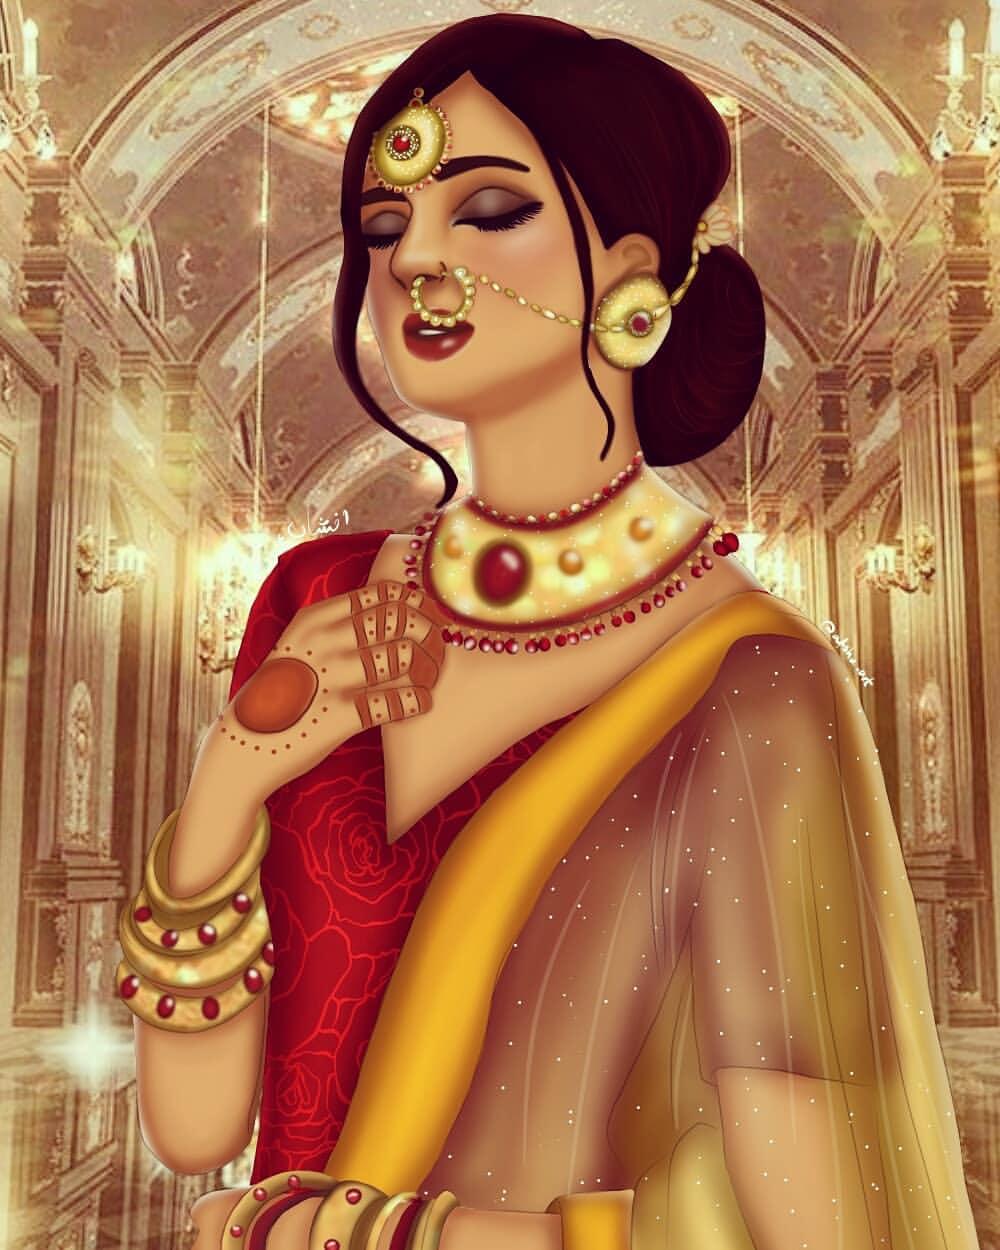 Artist Girl Afsha